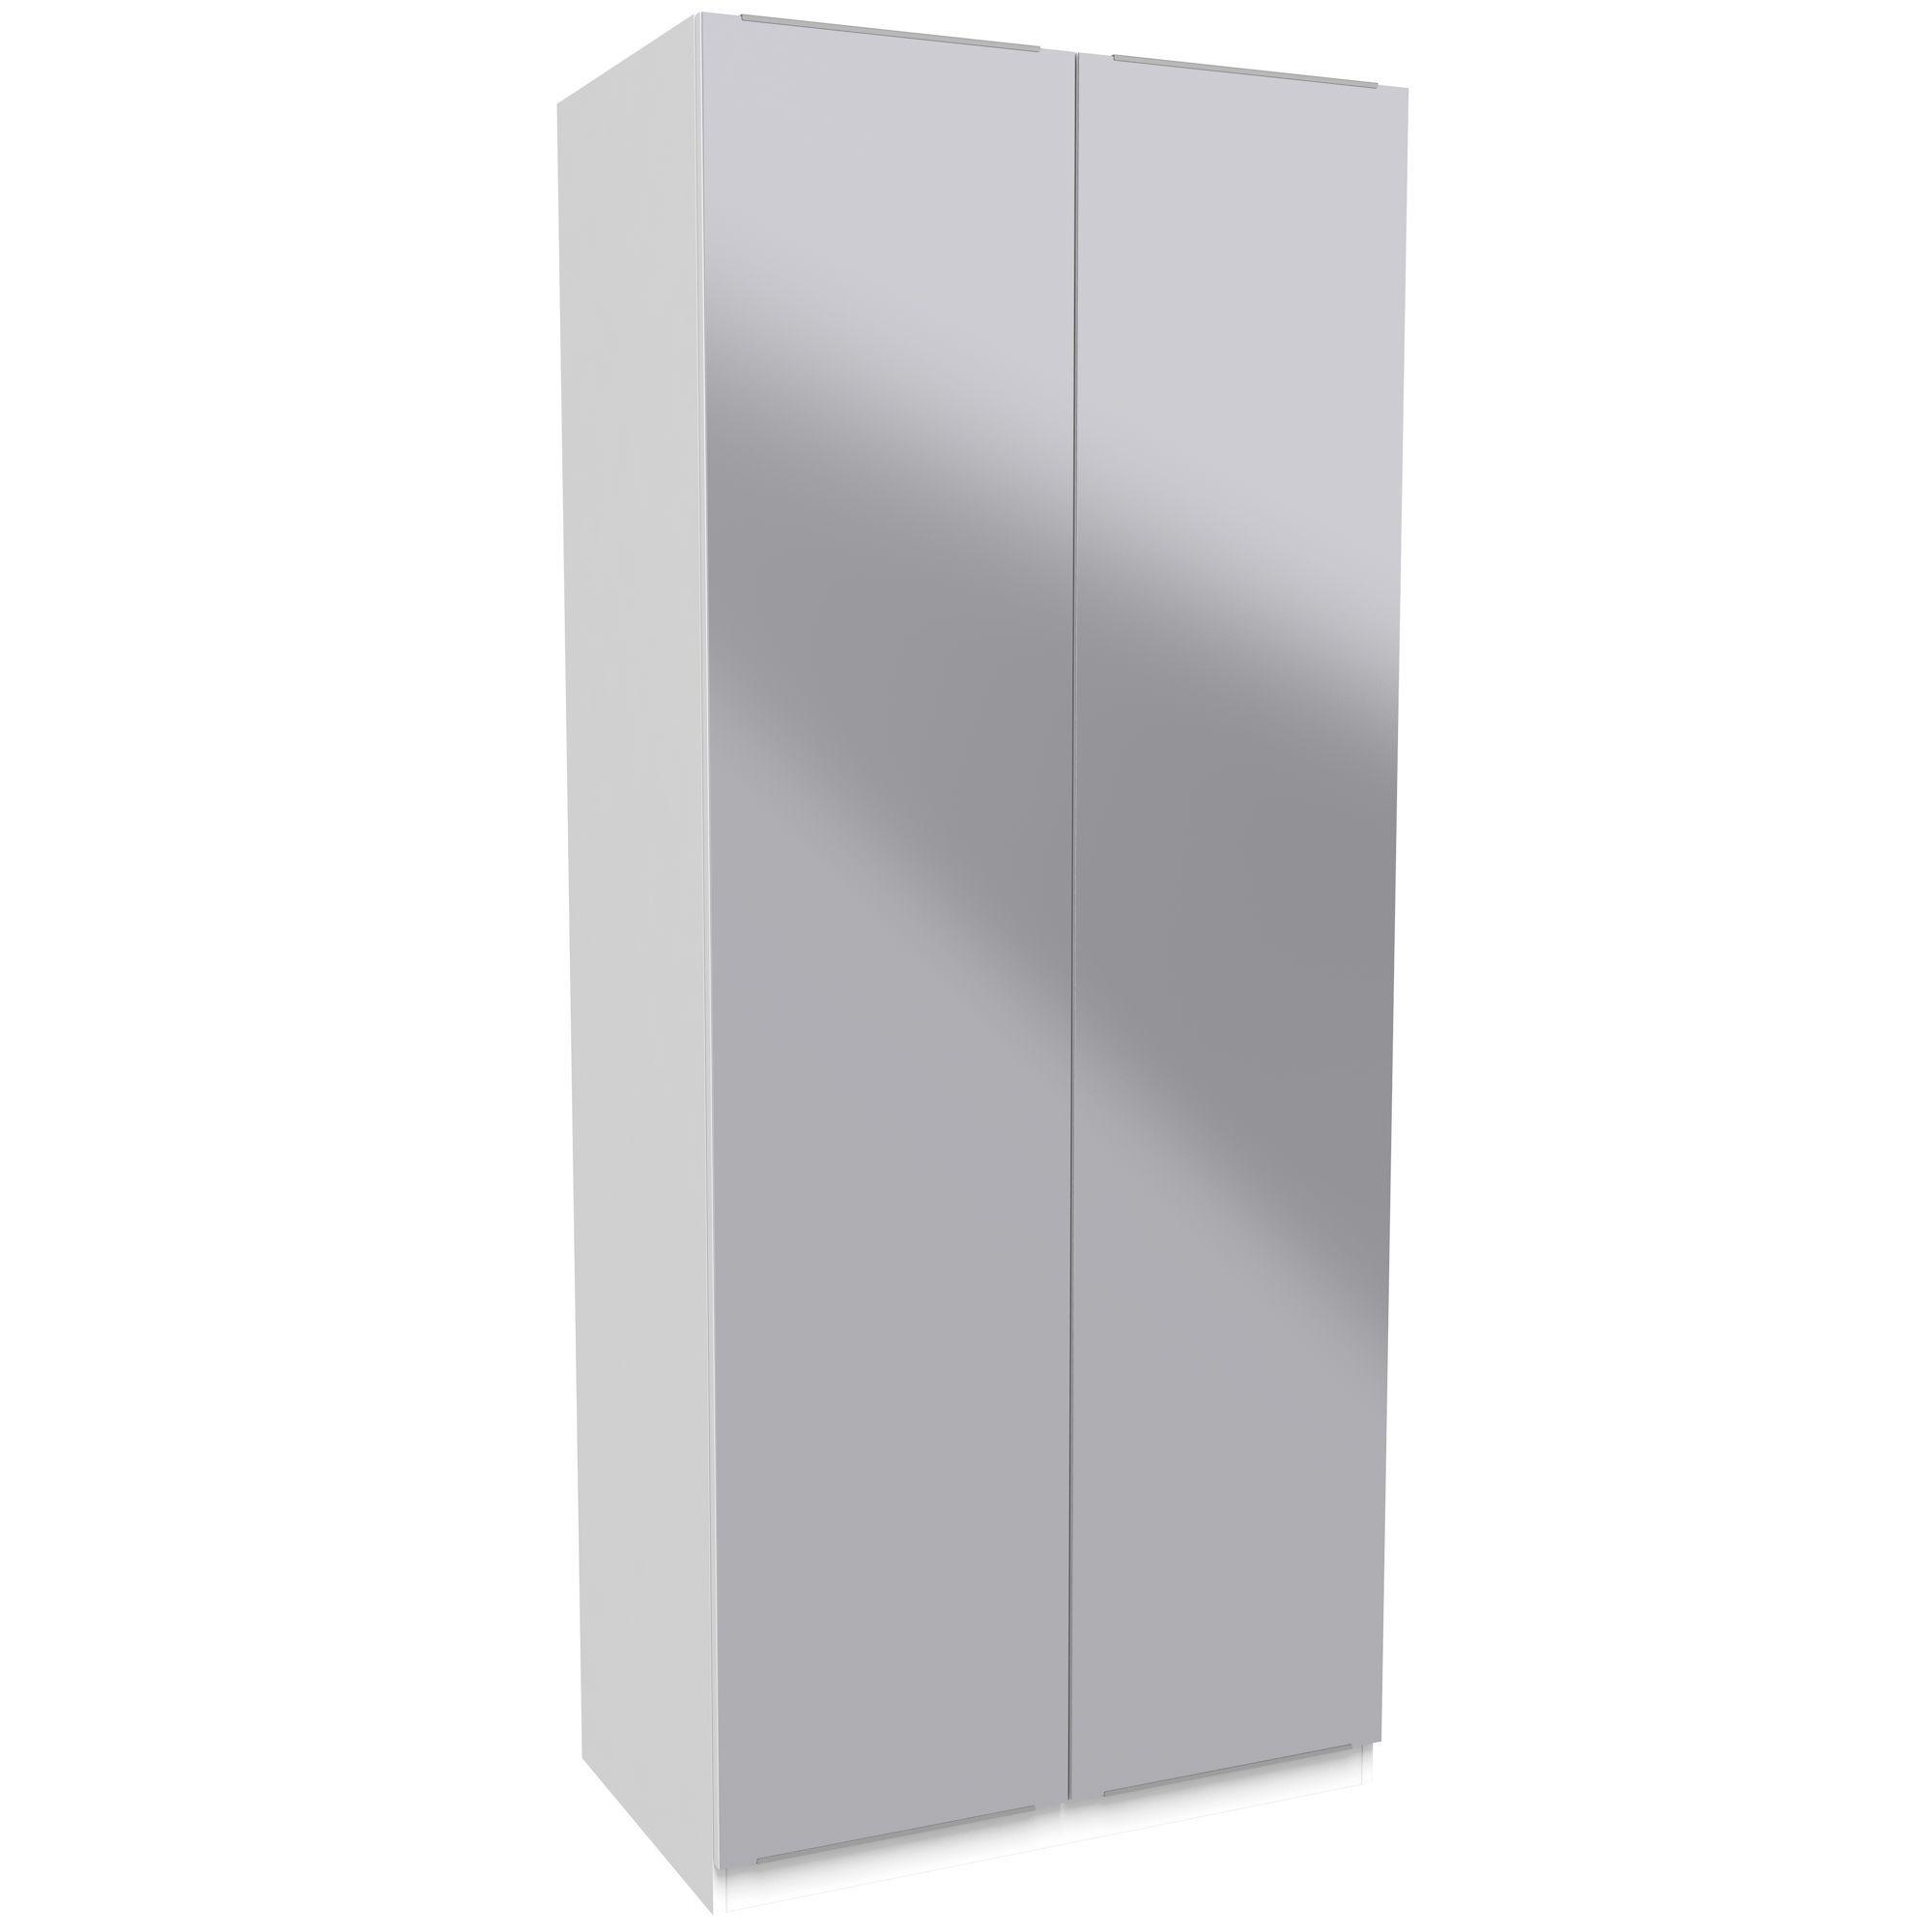 Darwin Handpicked White & Mirror Tall Double Wardrobe